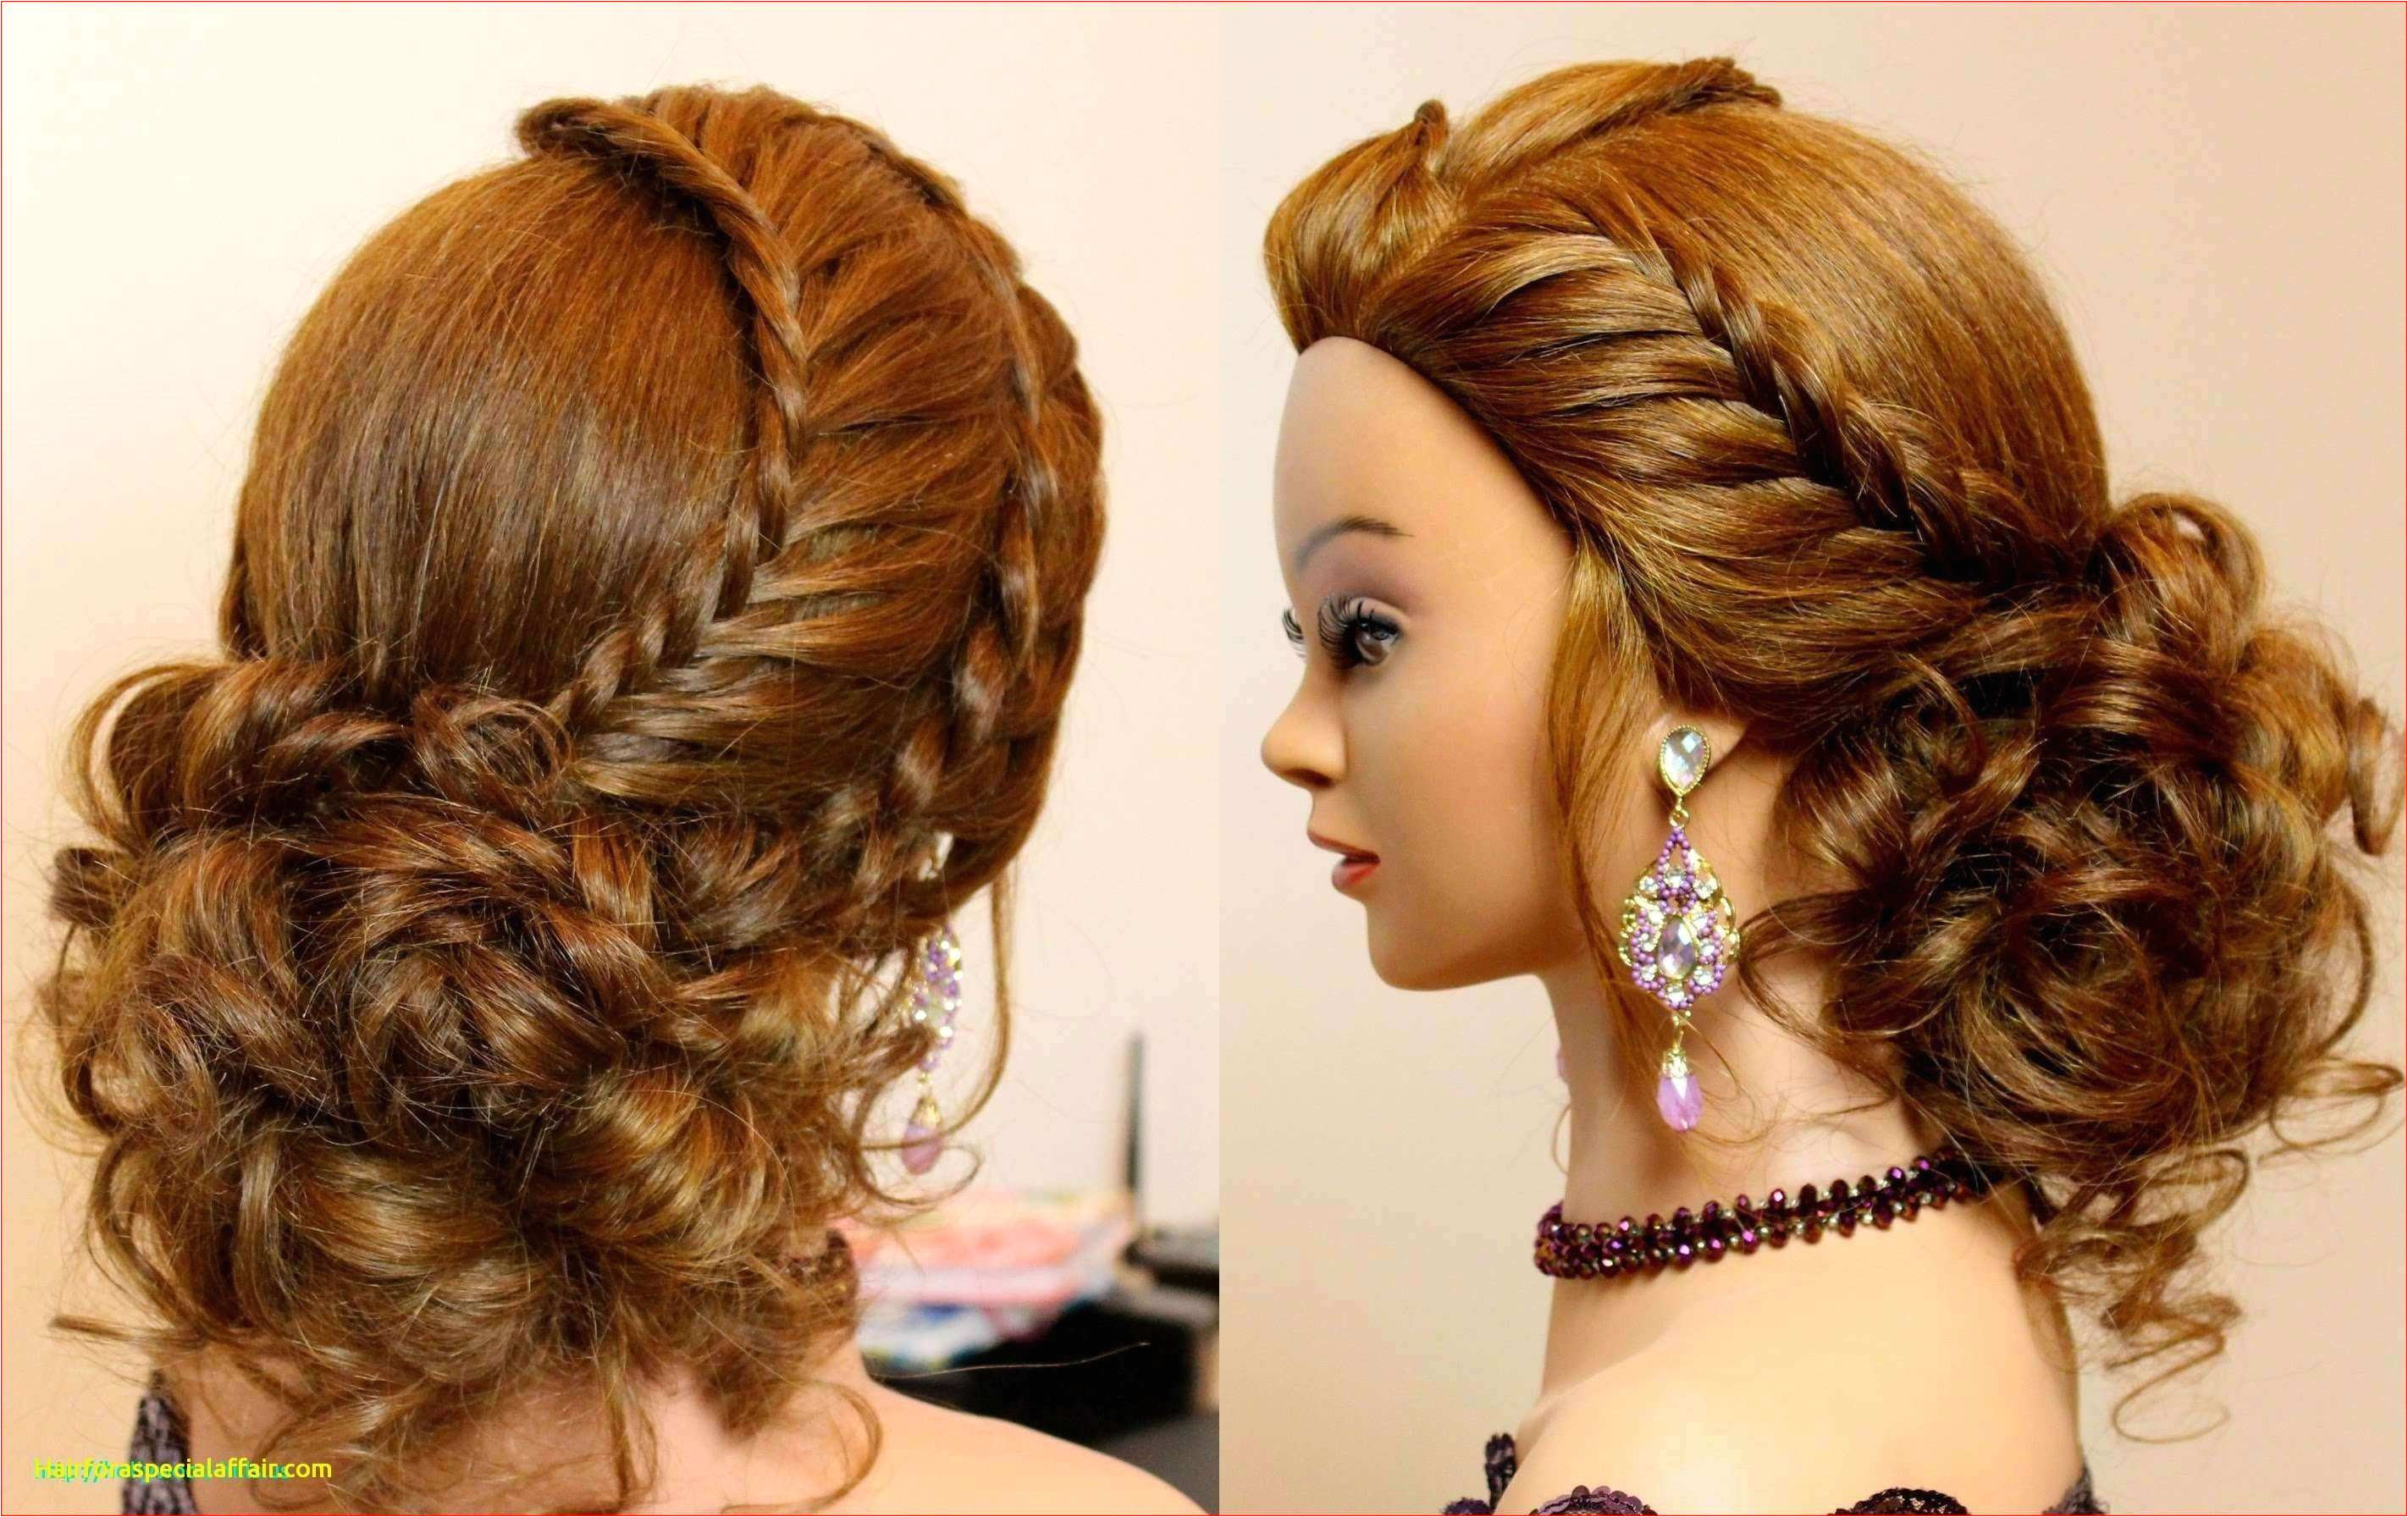 Braid Hairstyles for Girls Easy Elegant some Cute Hairstyles Cute Best Men Hairstyle 0d Afrohair Eu